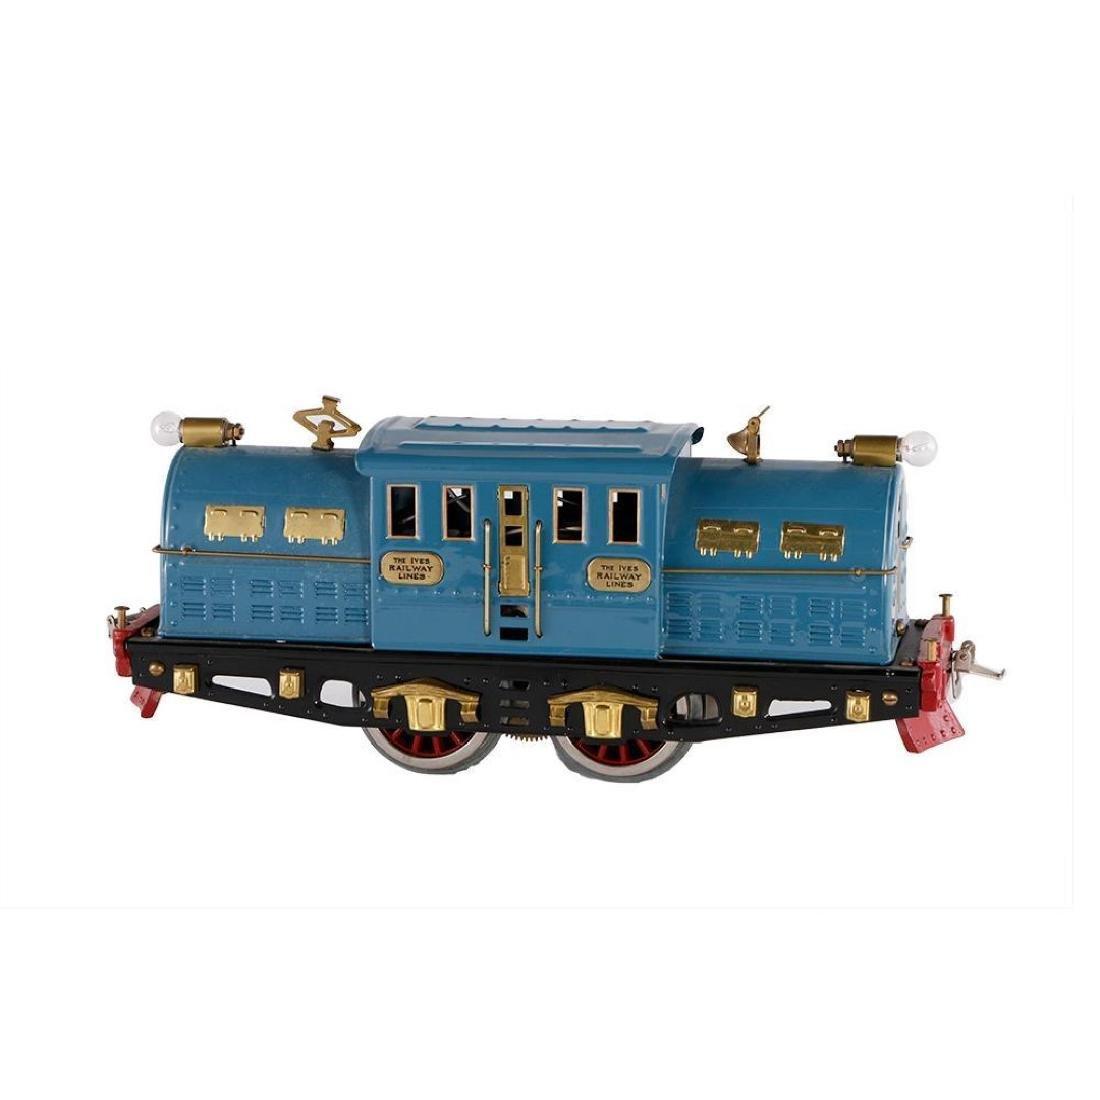 Rich-Art Reproduction Ives Standard Gauge Locomotive